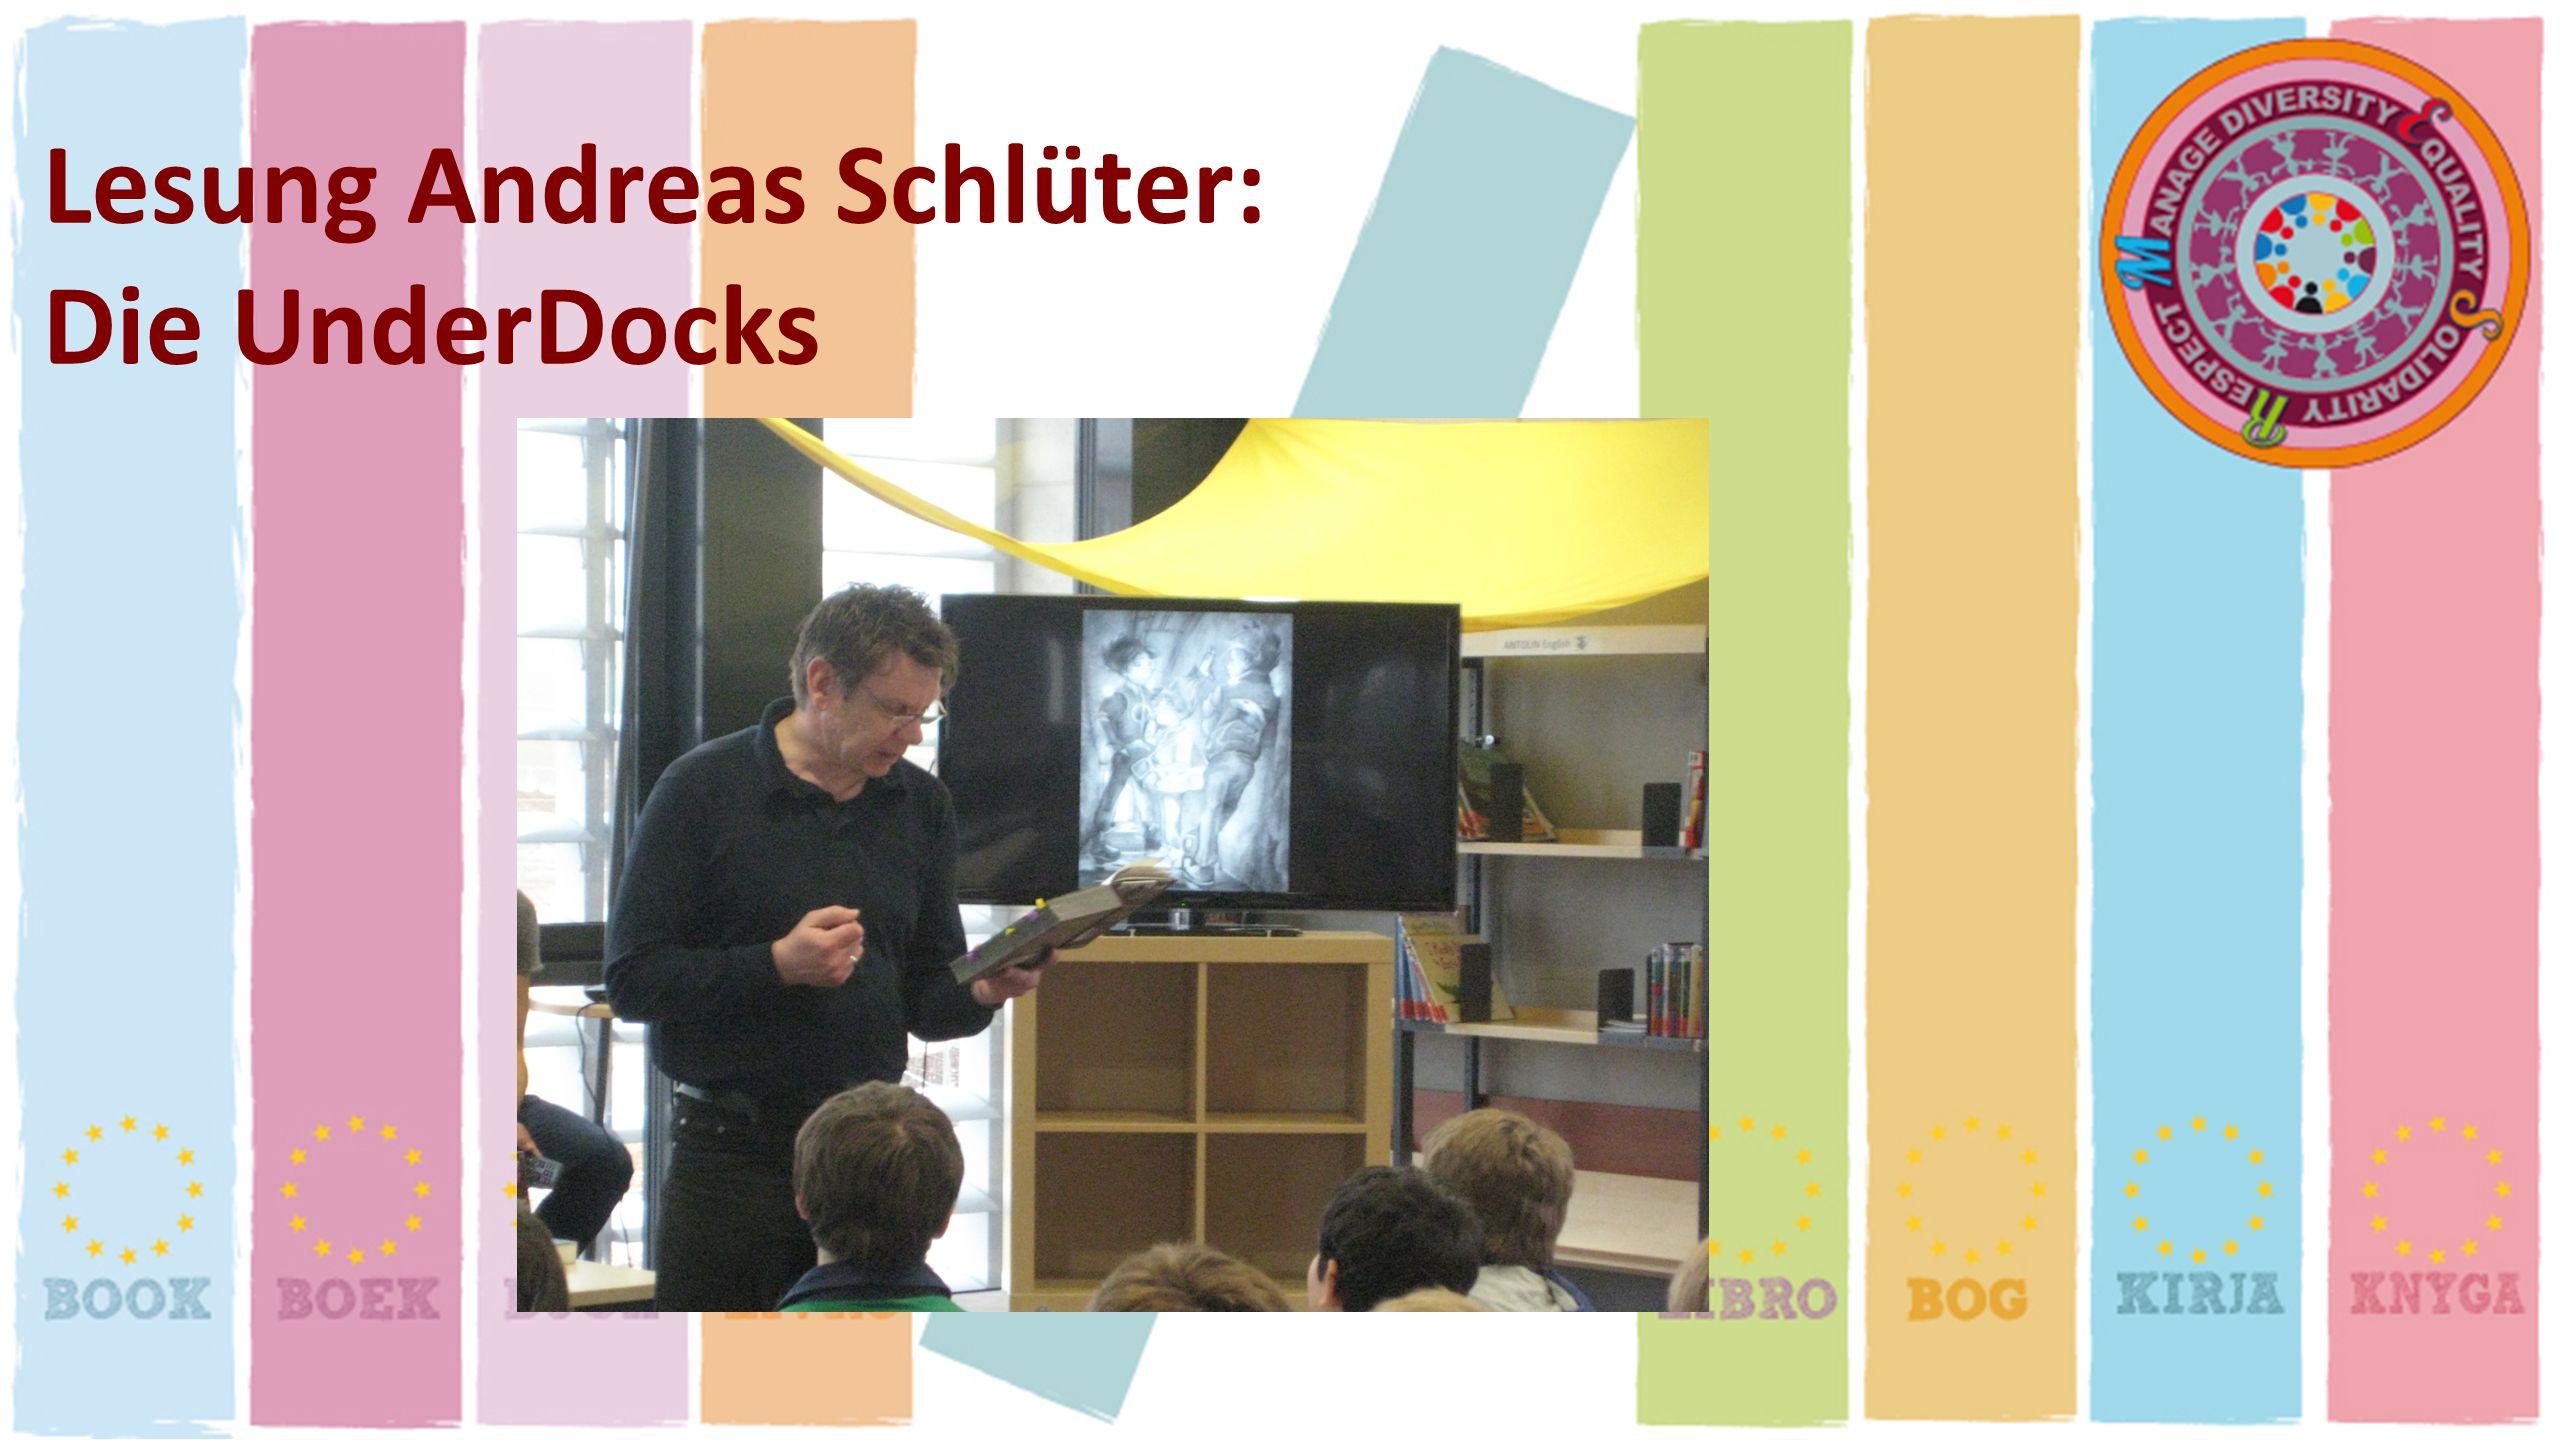 Lesung Andreas Schlüter: